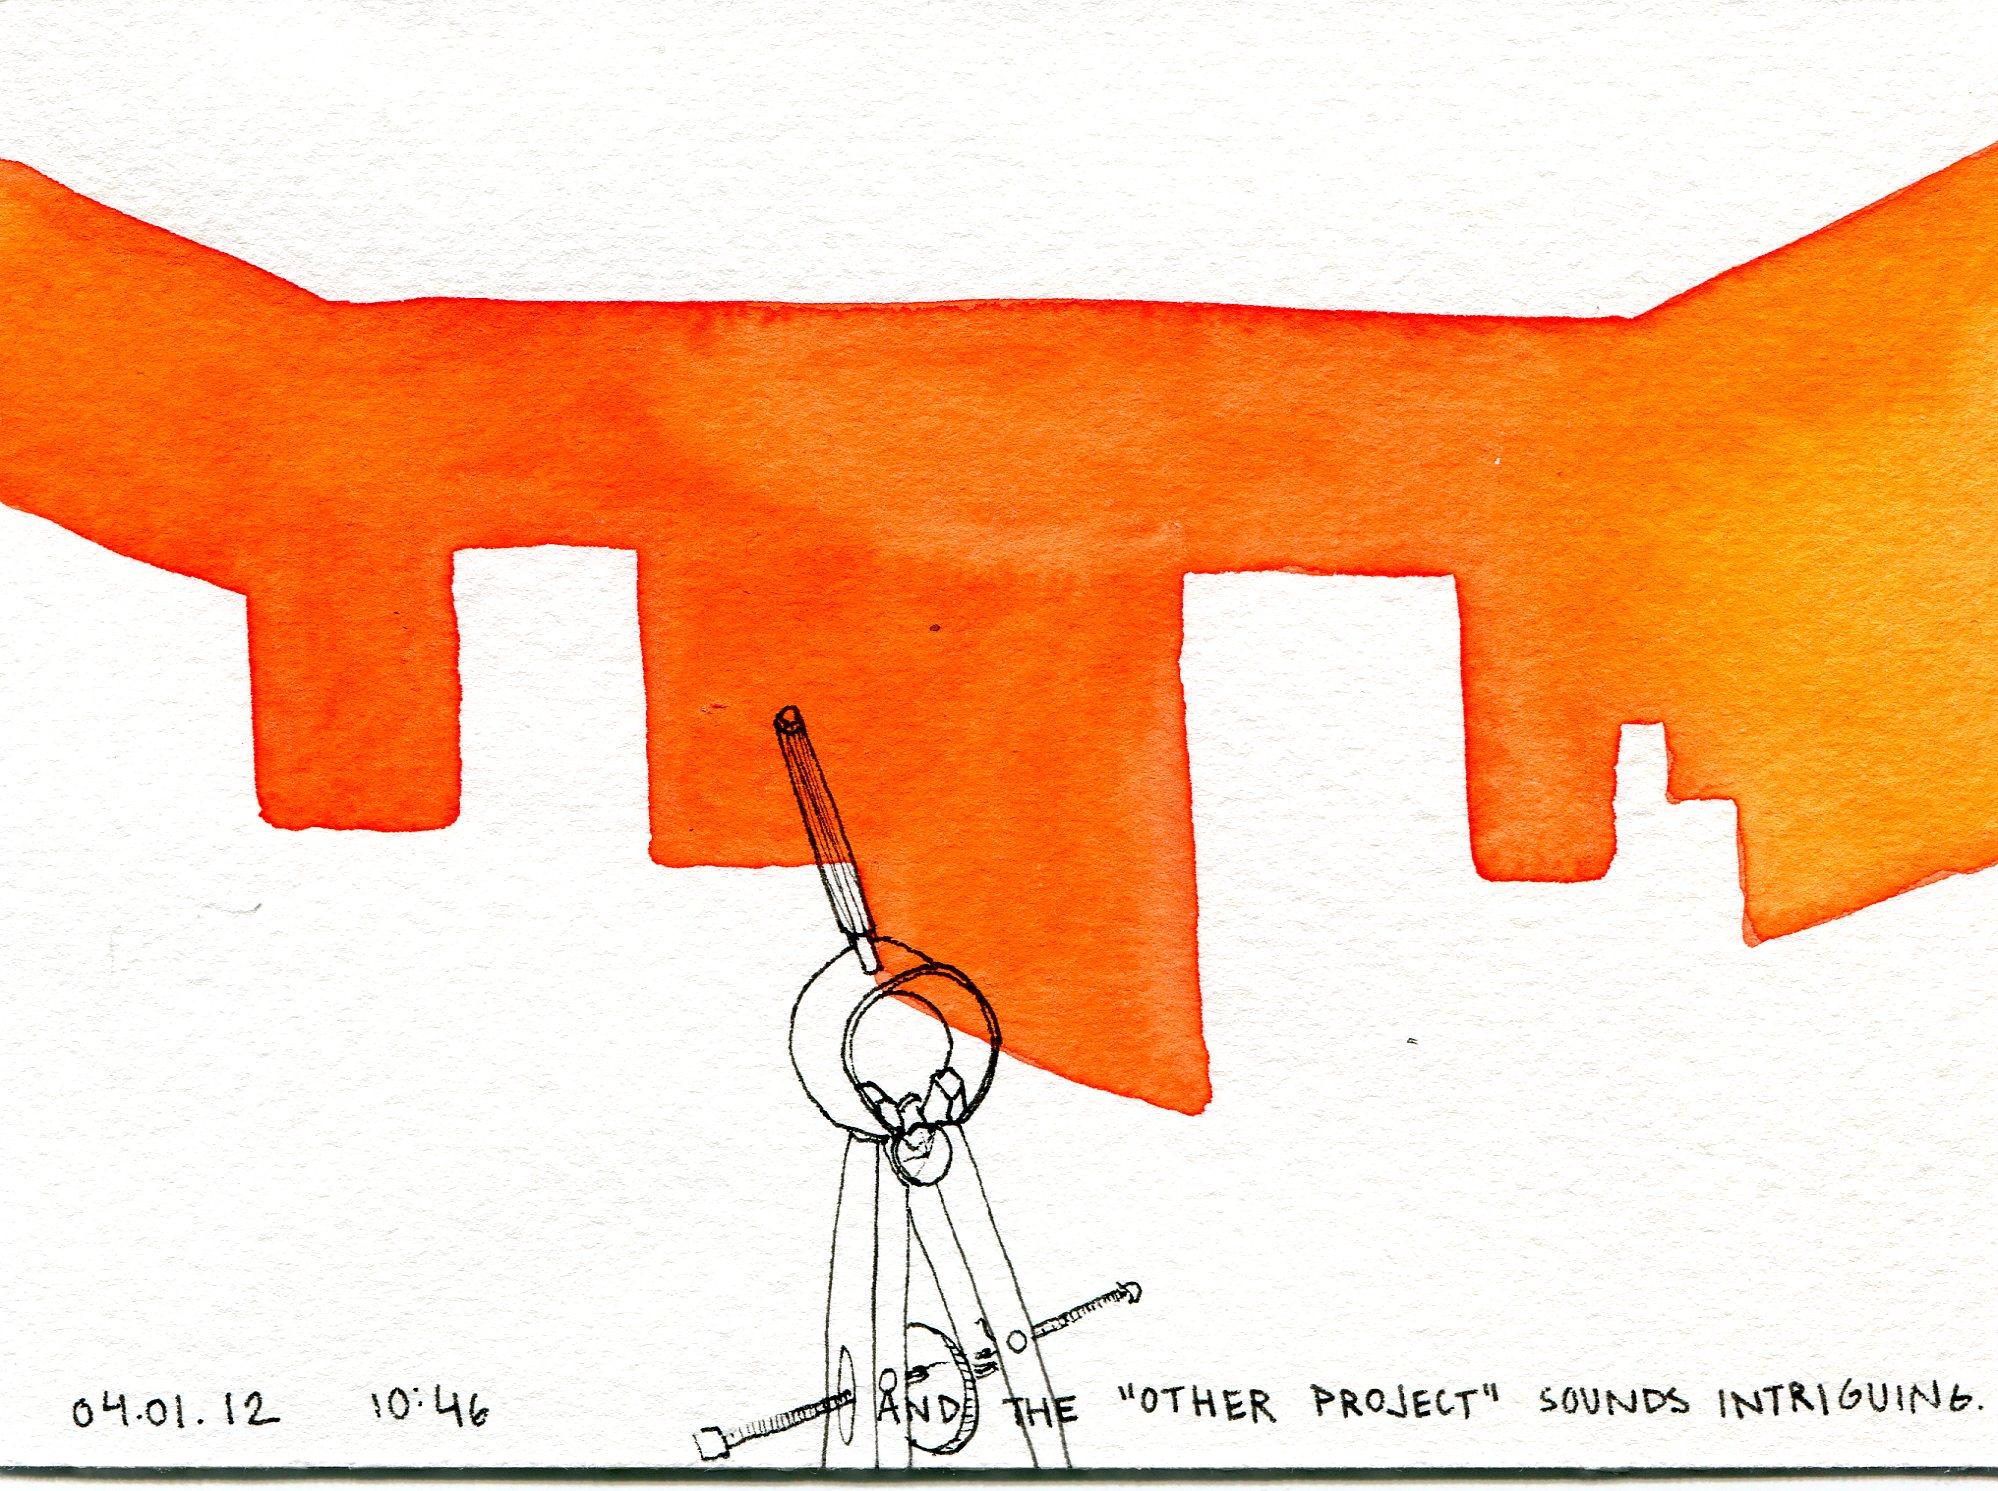 2012-04-07 drawing001.jpg